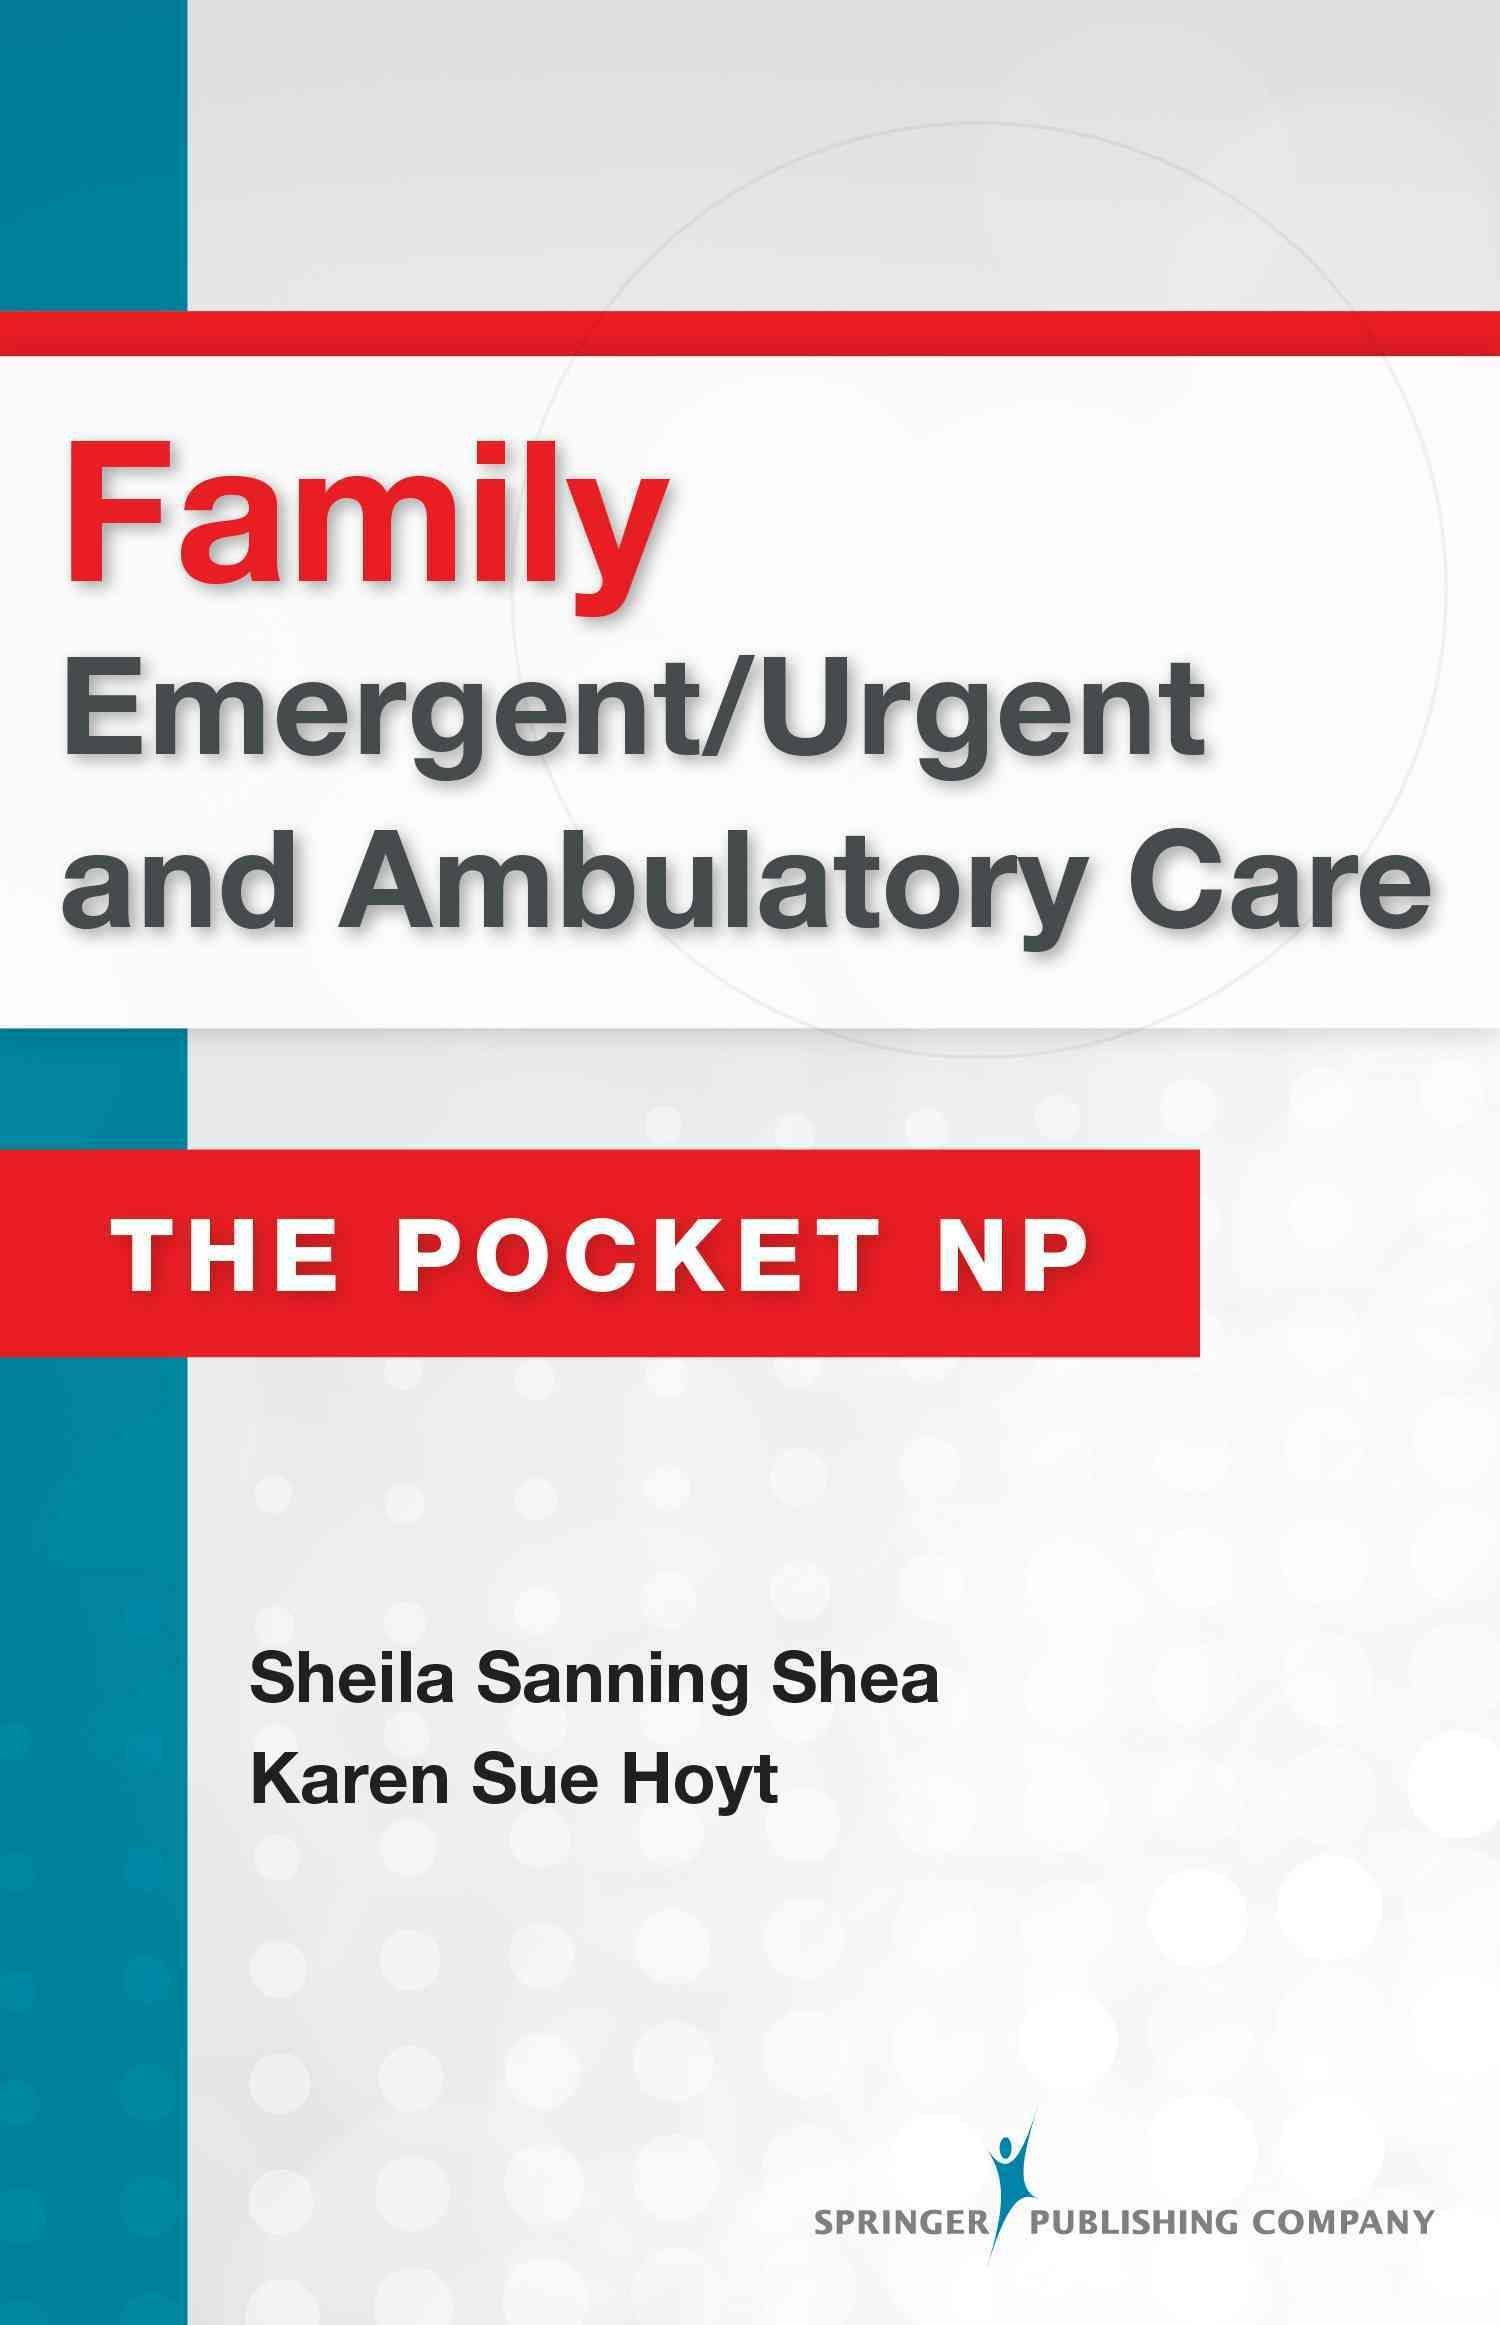 Family Emergent / Urgent and Ambulatory Care School